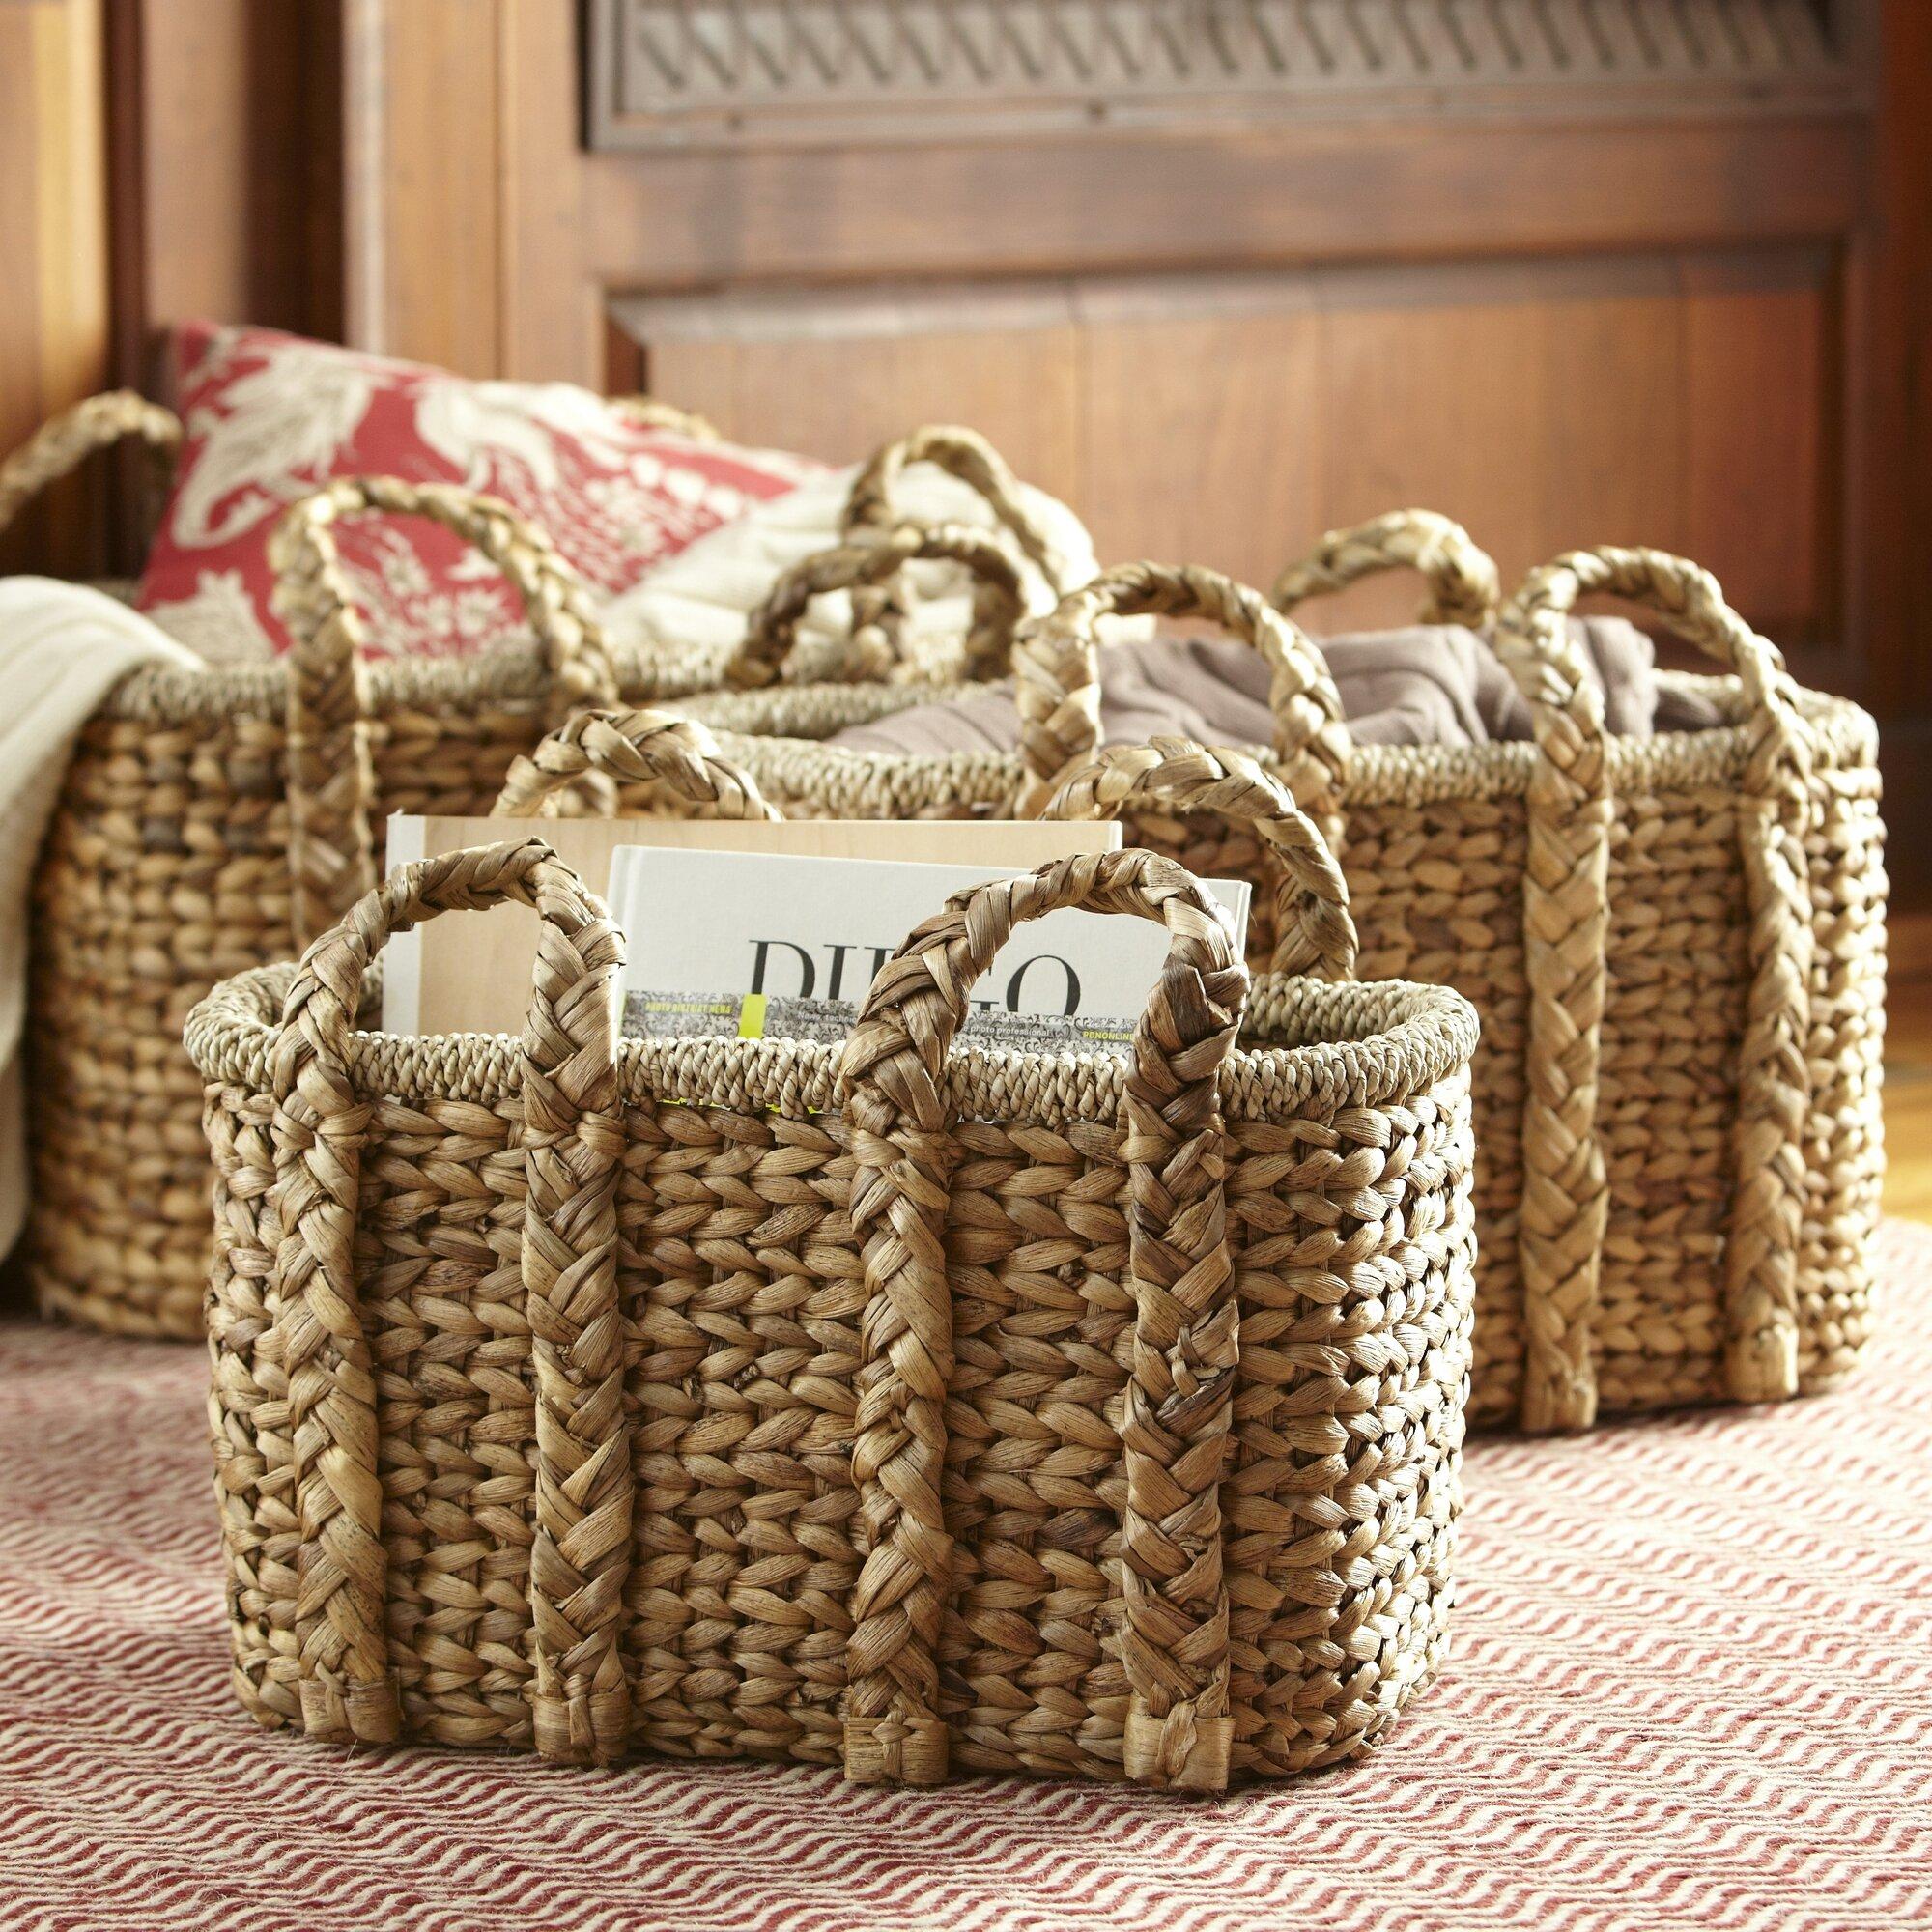 Decor Look Alikes | Birch Lane Handled Storage Basket